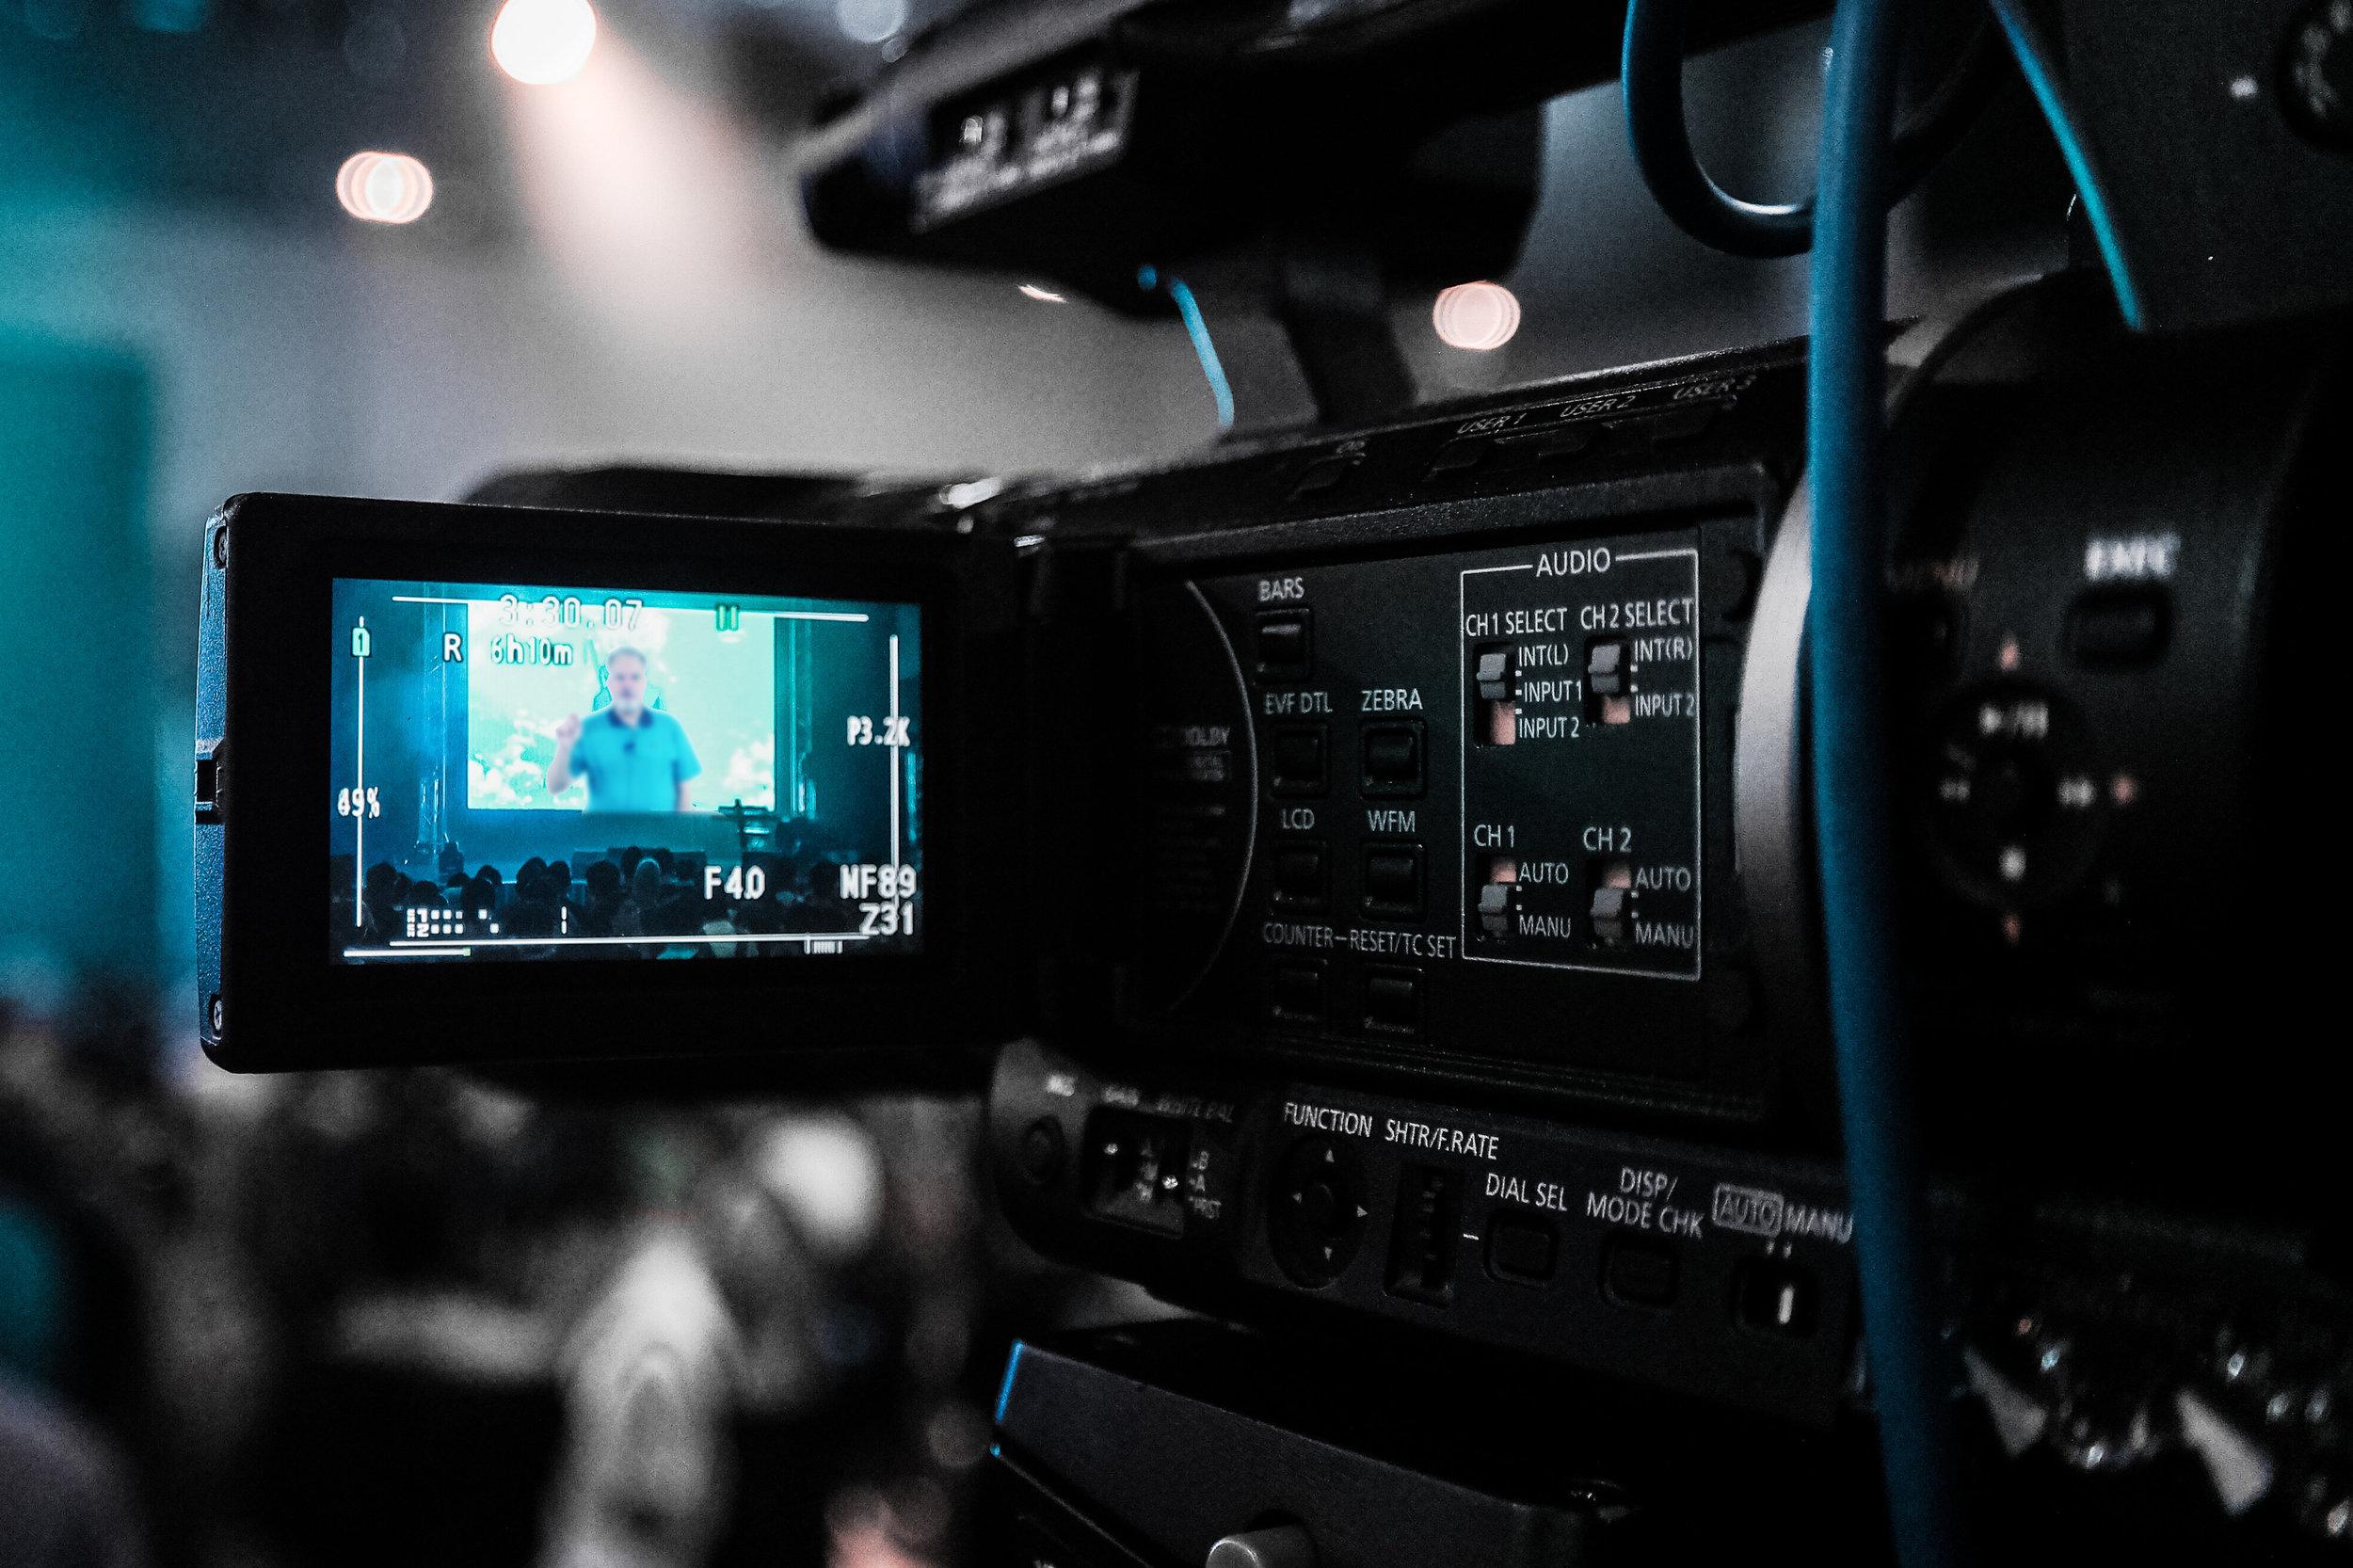 broadcast-broadcasting-camcorder-66134 copy.jpg